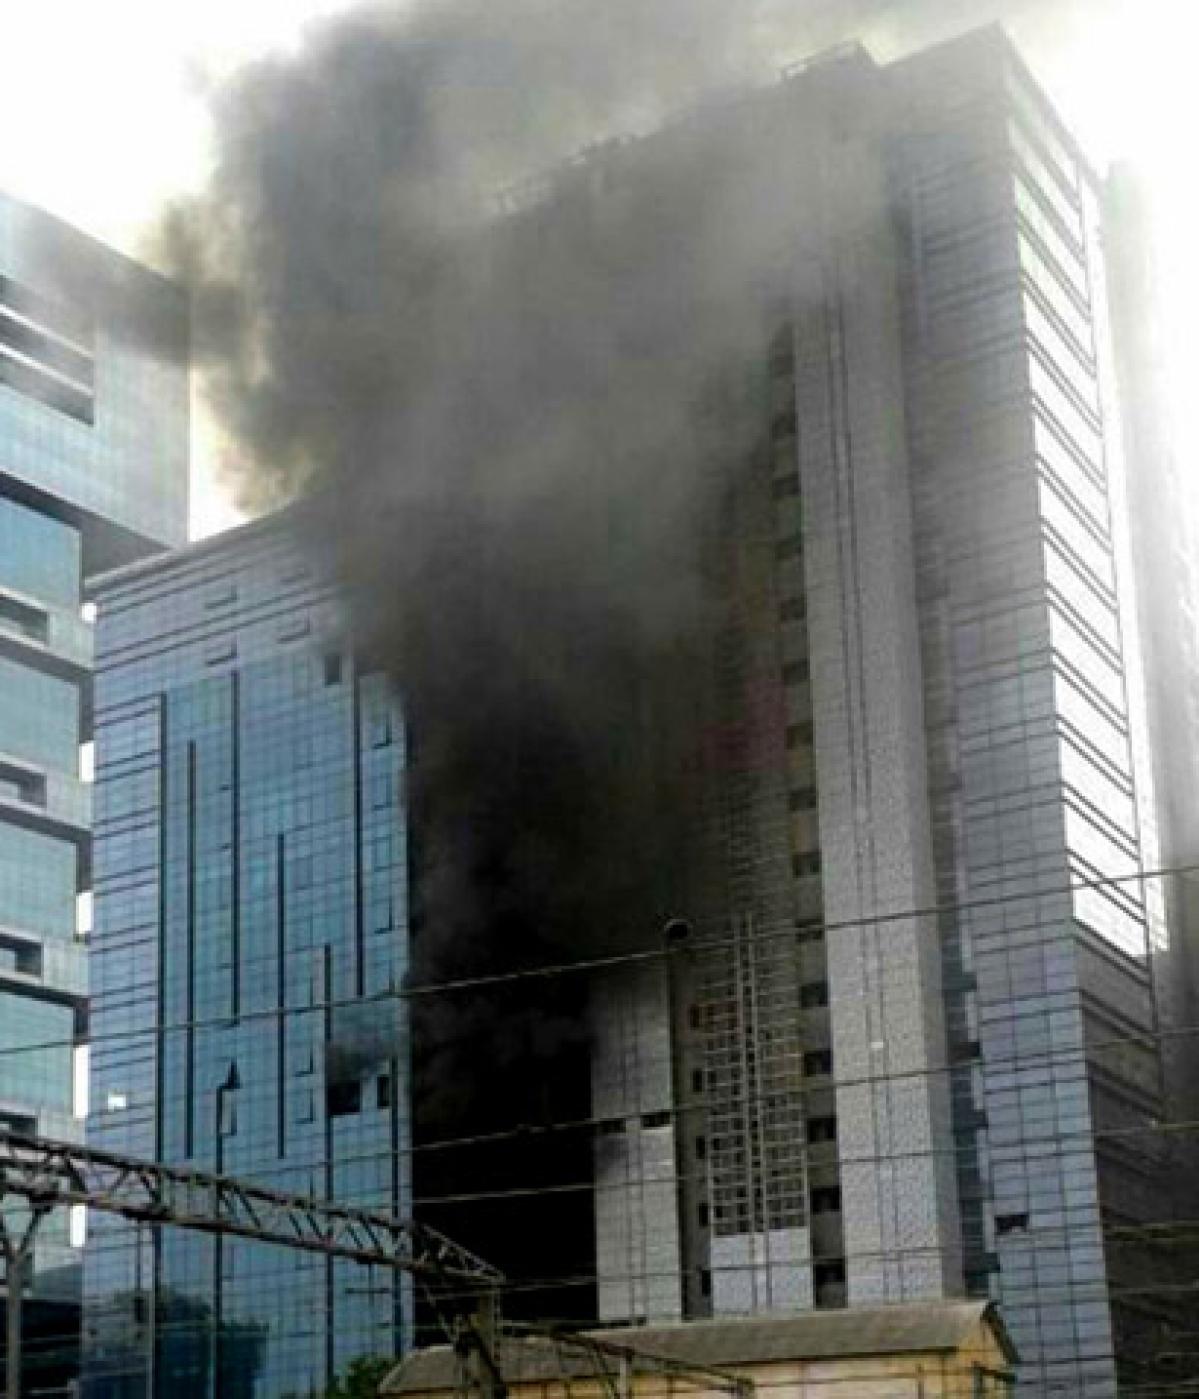 Fire-fighting equipment was dysfunctional in bldg